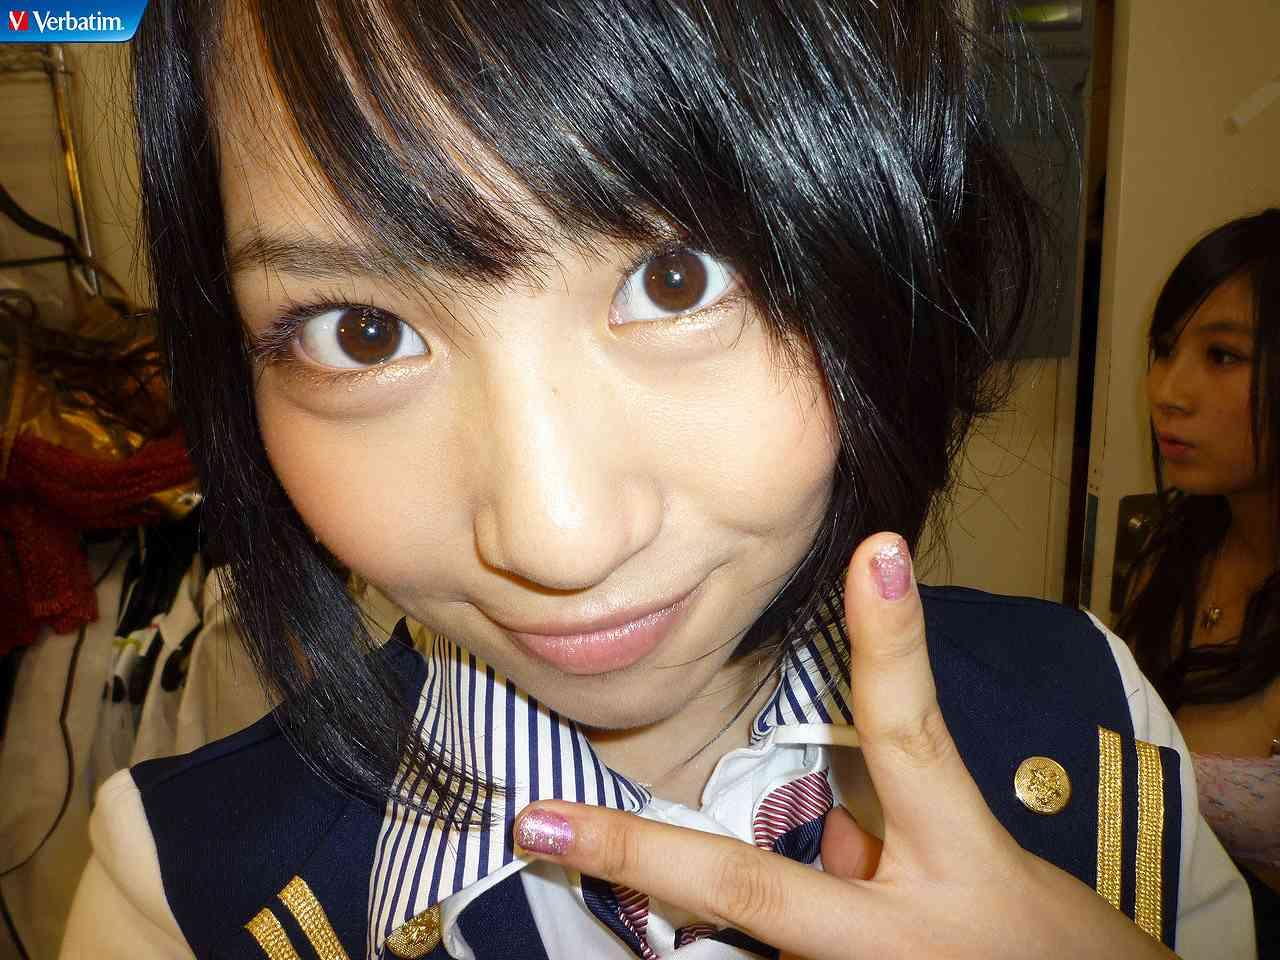 AKB48の楽屋で写りこんんだメンバーの下着姿